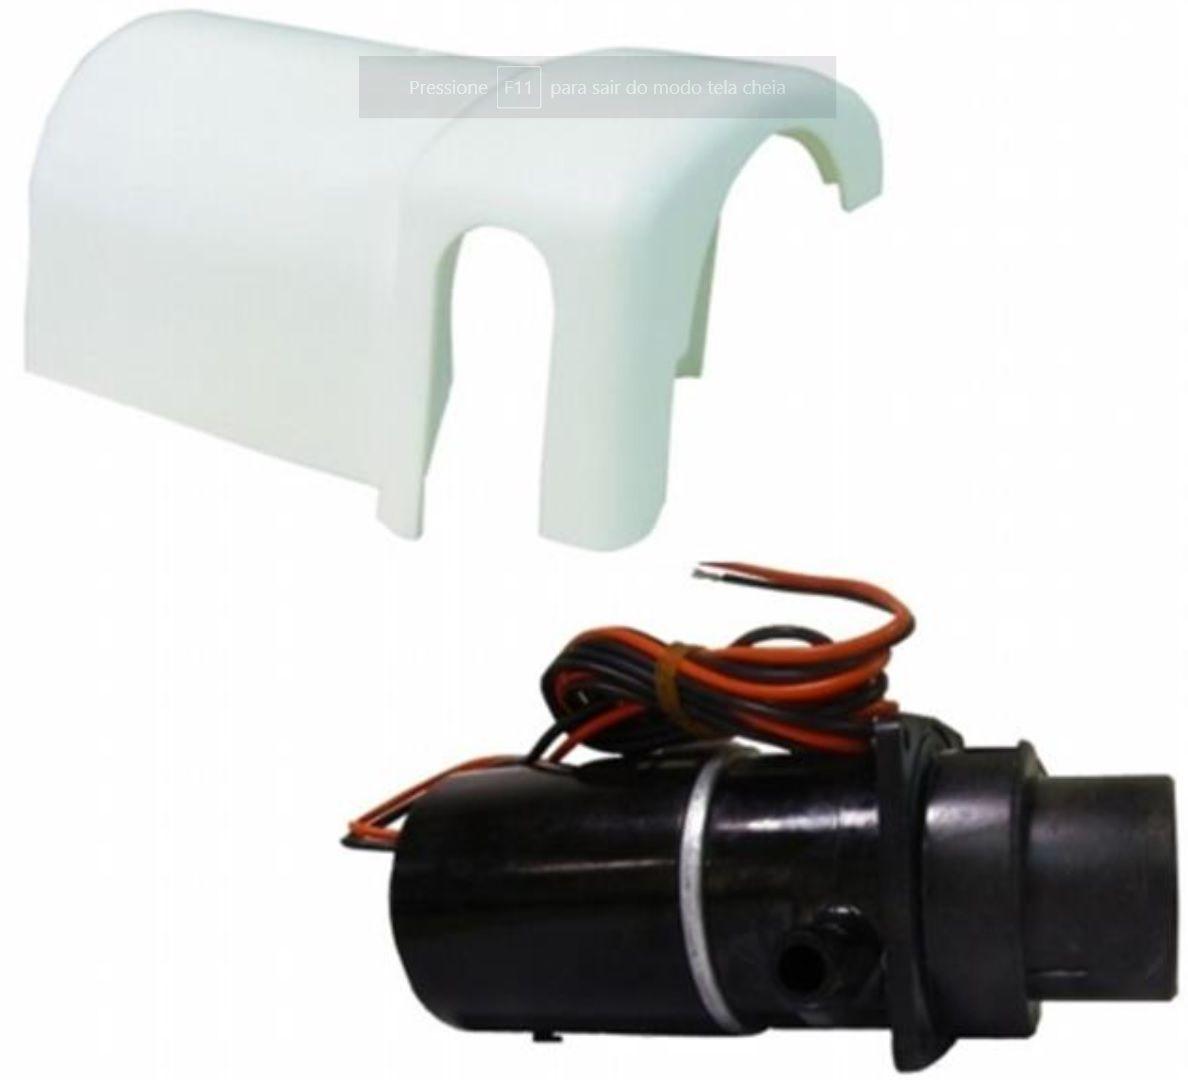 Bomba Maceradora Jabsco para Vaso Sanitário Elétrico 12V Jabsco e TMC - Modelo 37041-0010